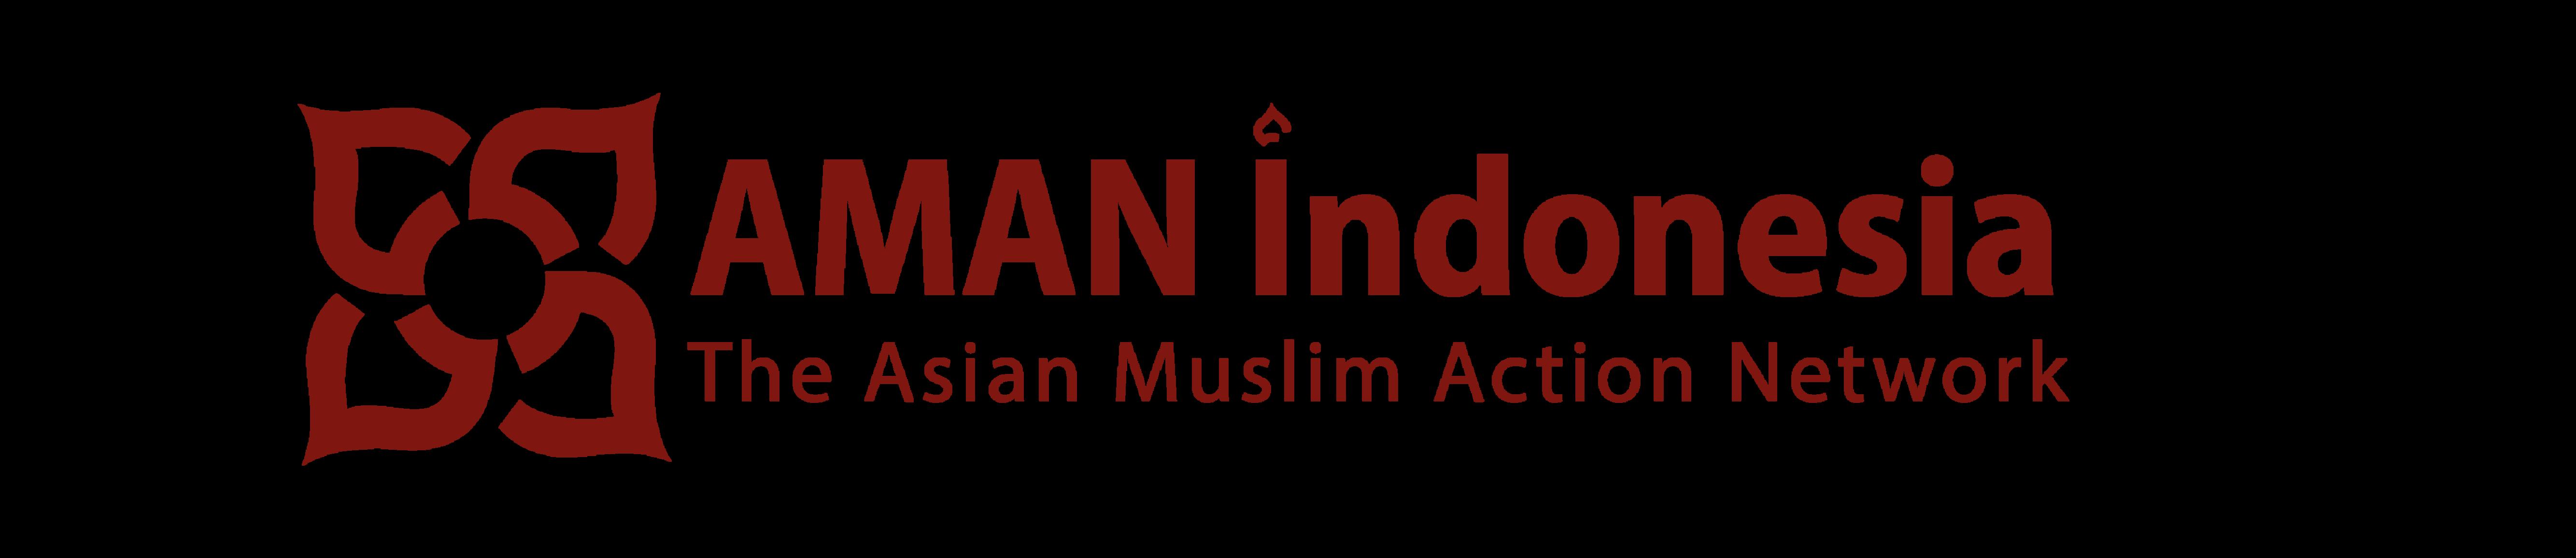 AMAN Indonesia logo